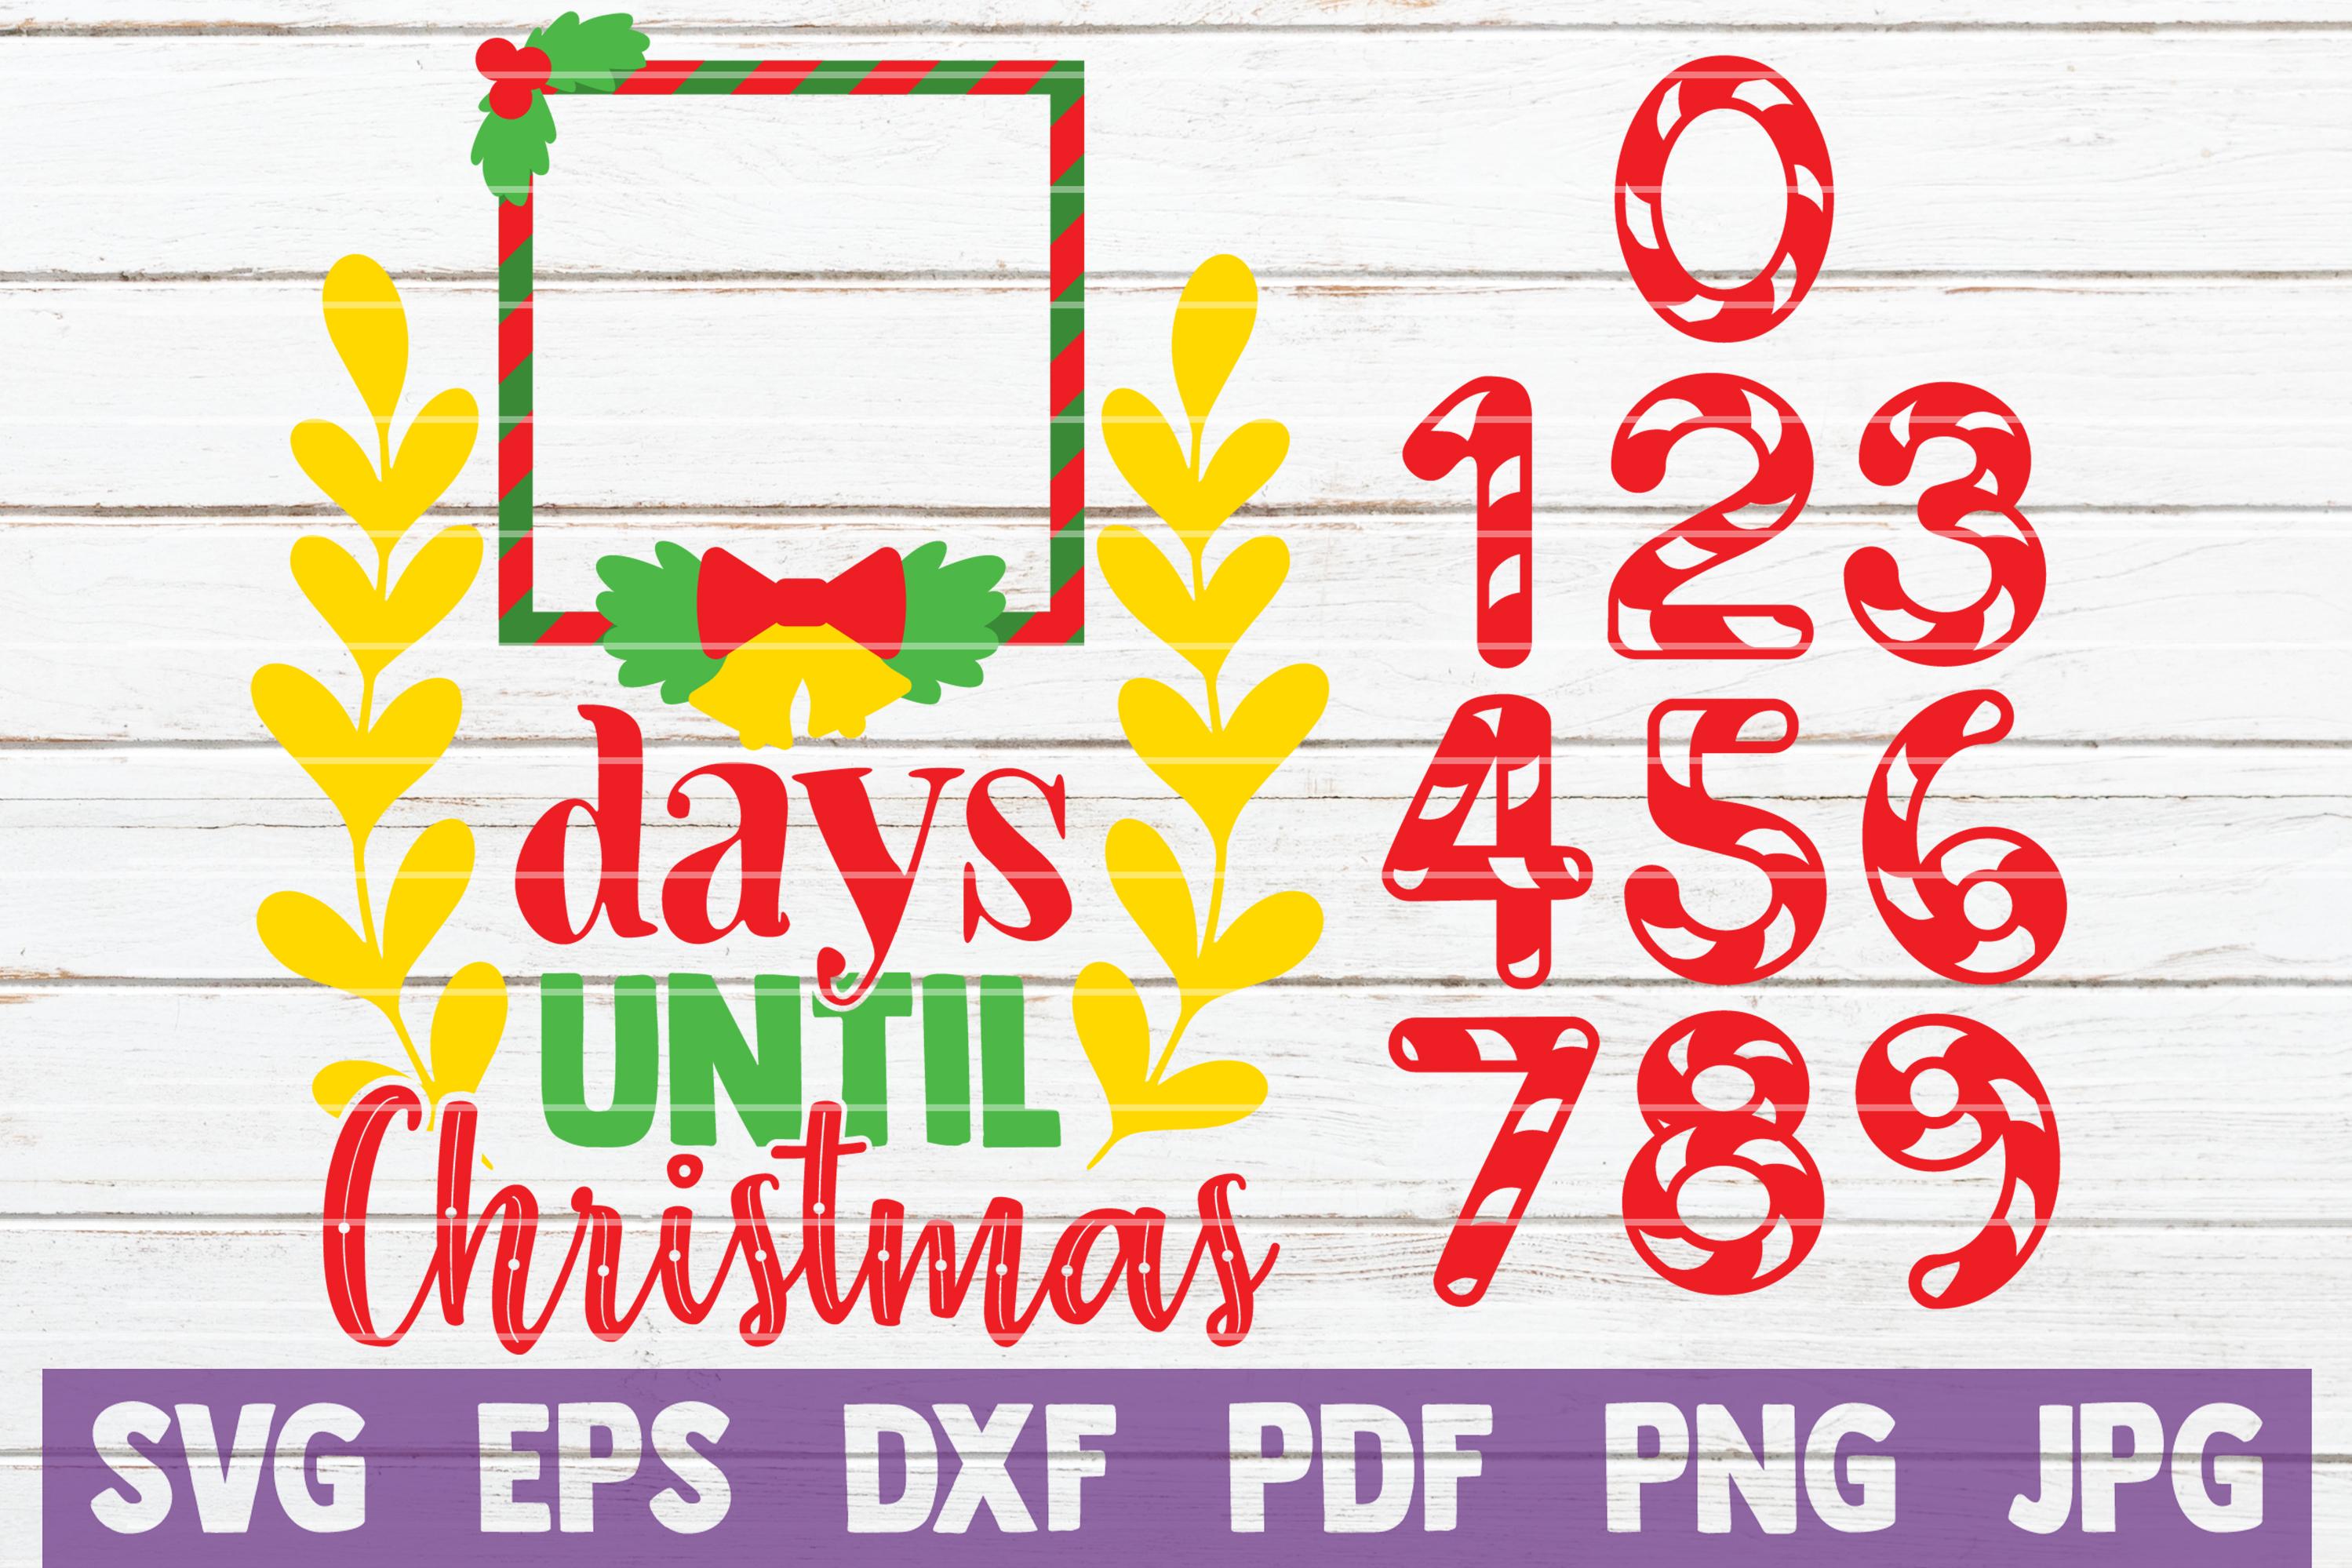 HUGE Christmas SVG Bundle |100 Holiday Designs SVG Cut Files example image 11